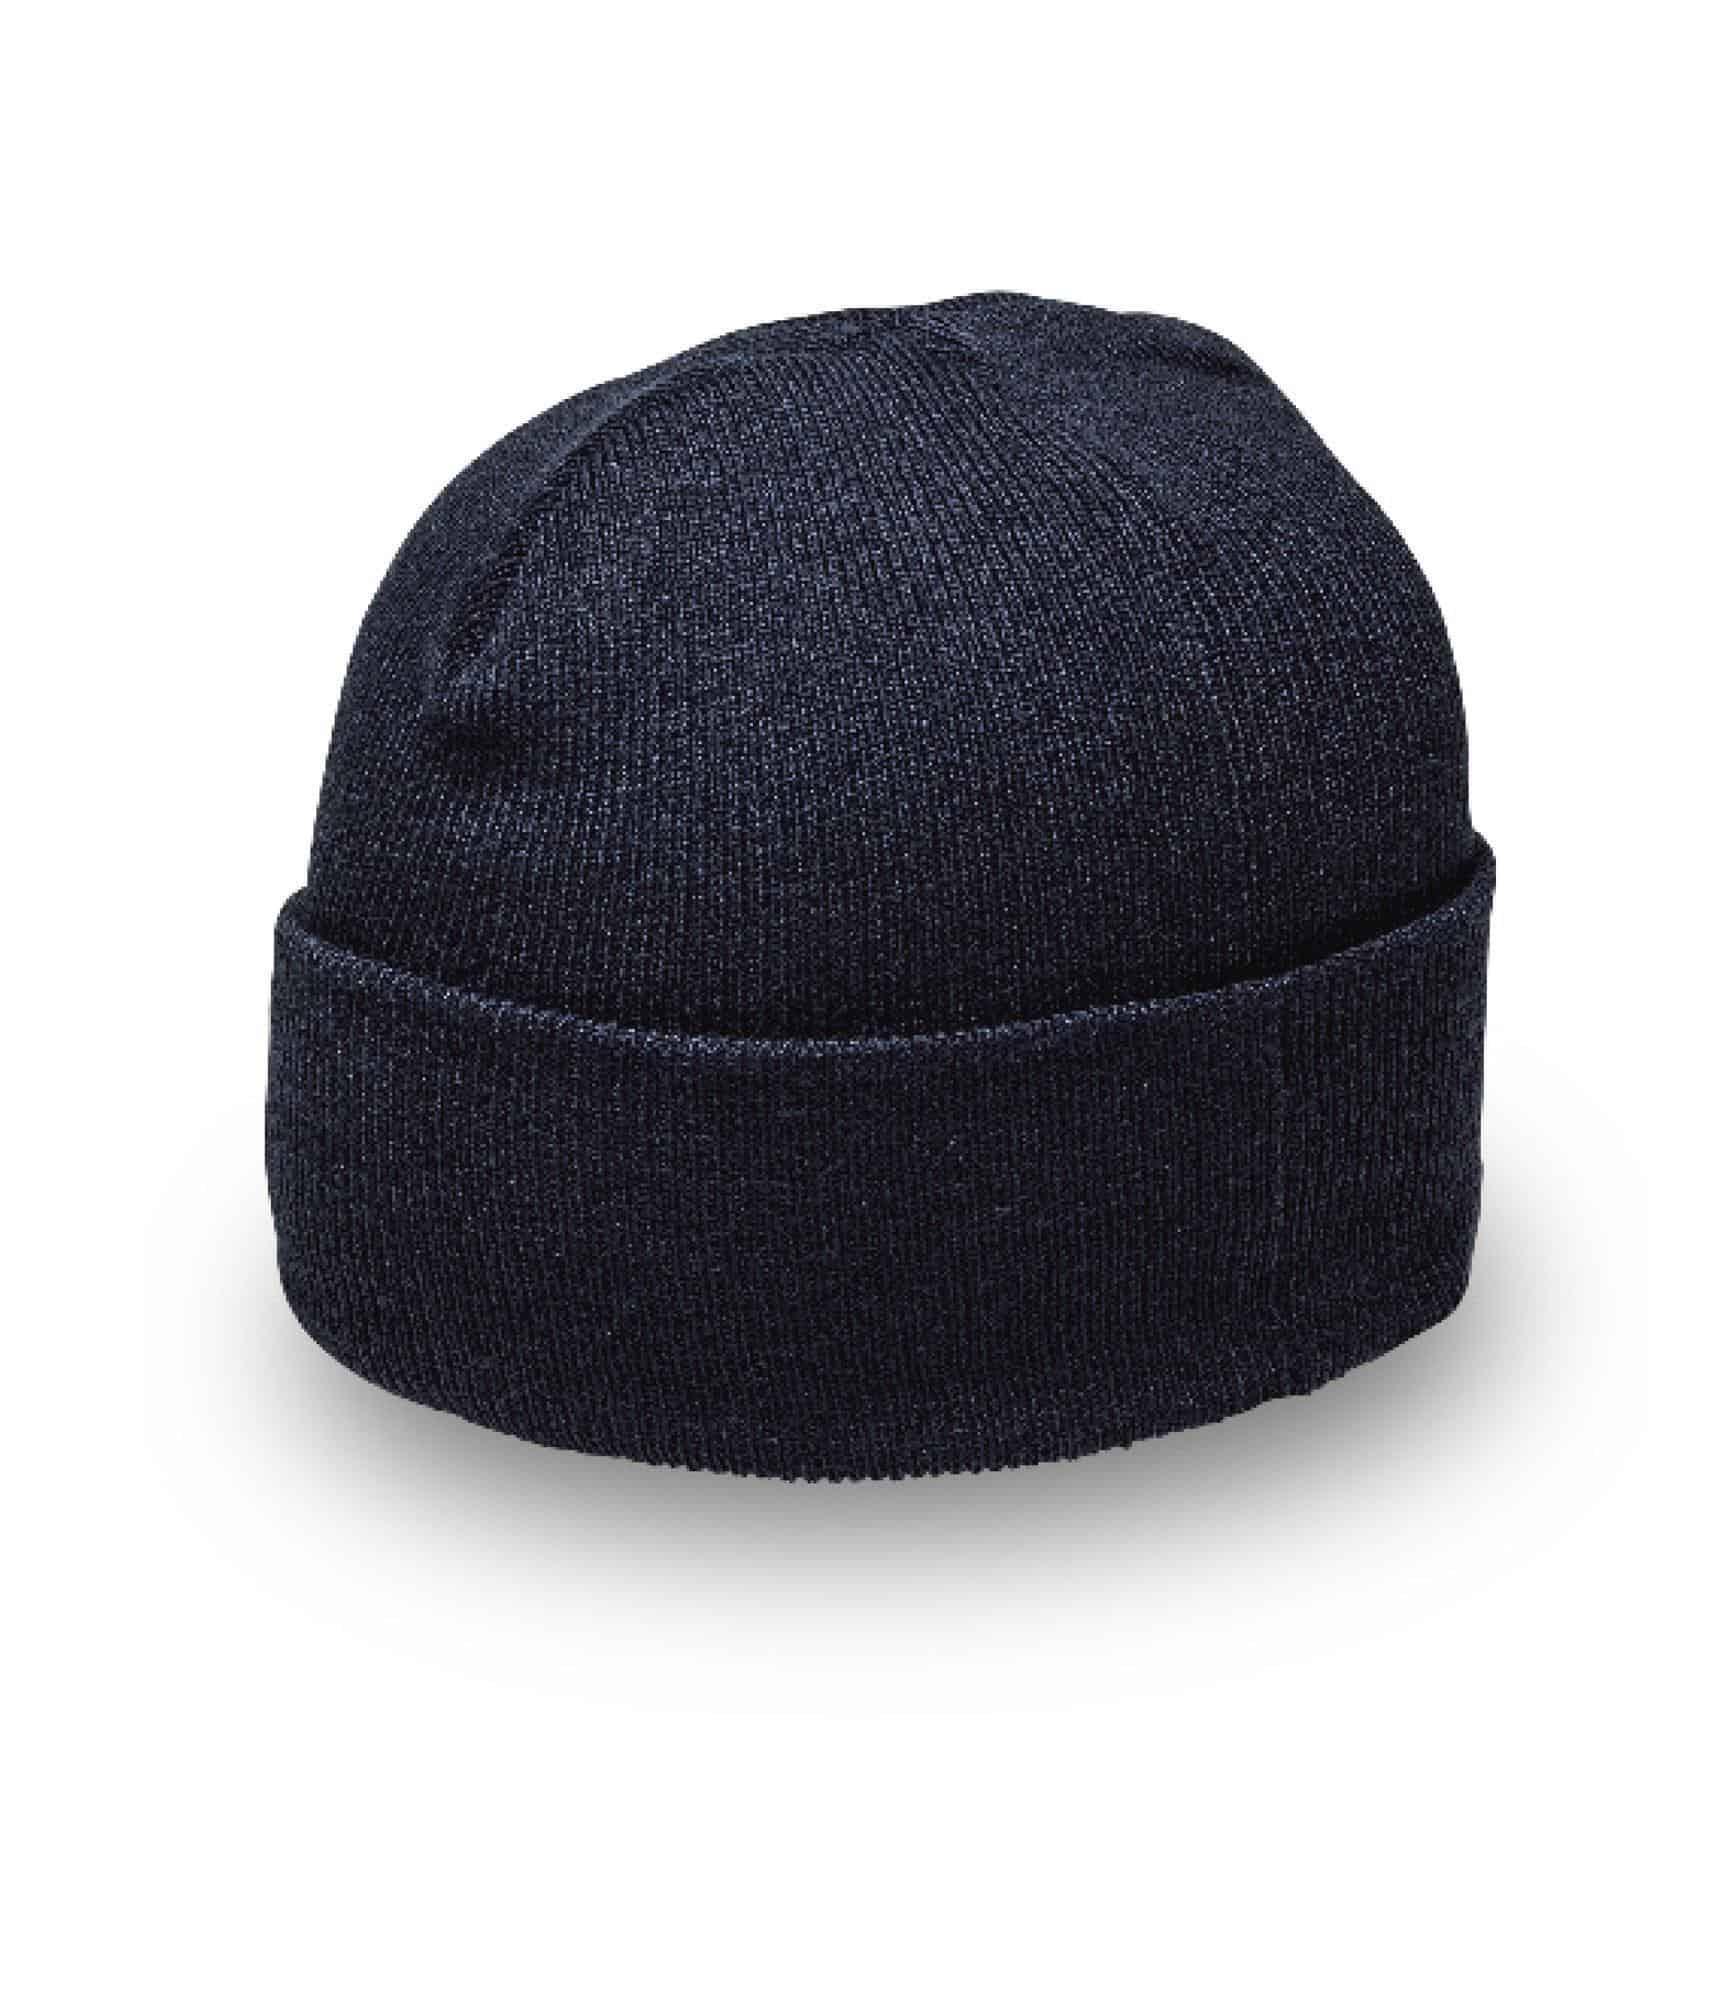 Cuffed Knitted Beanies – SA Headwear and Accessories